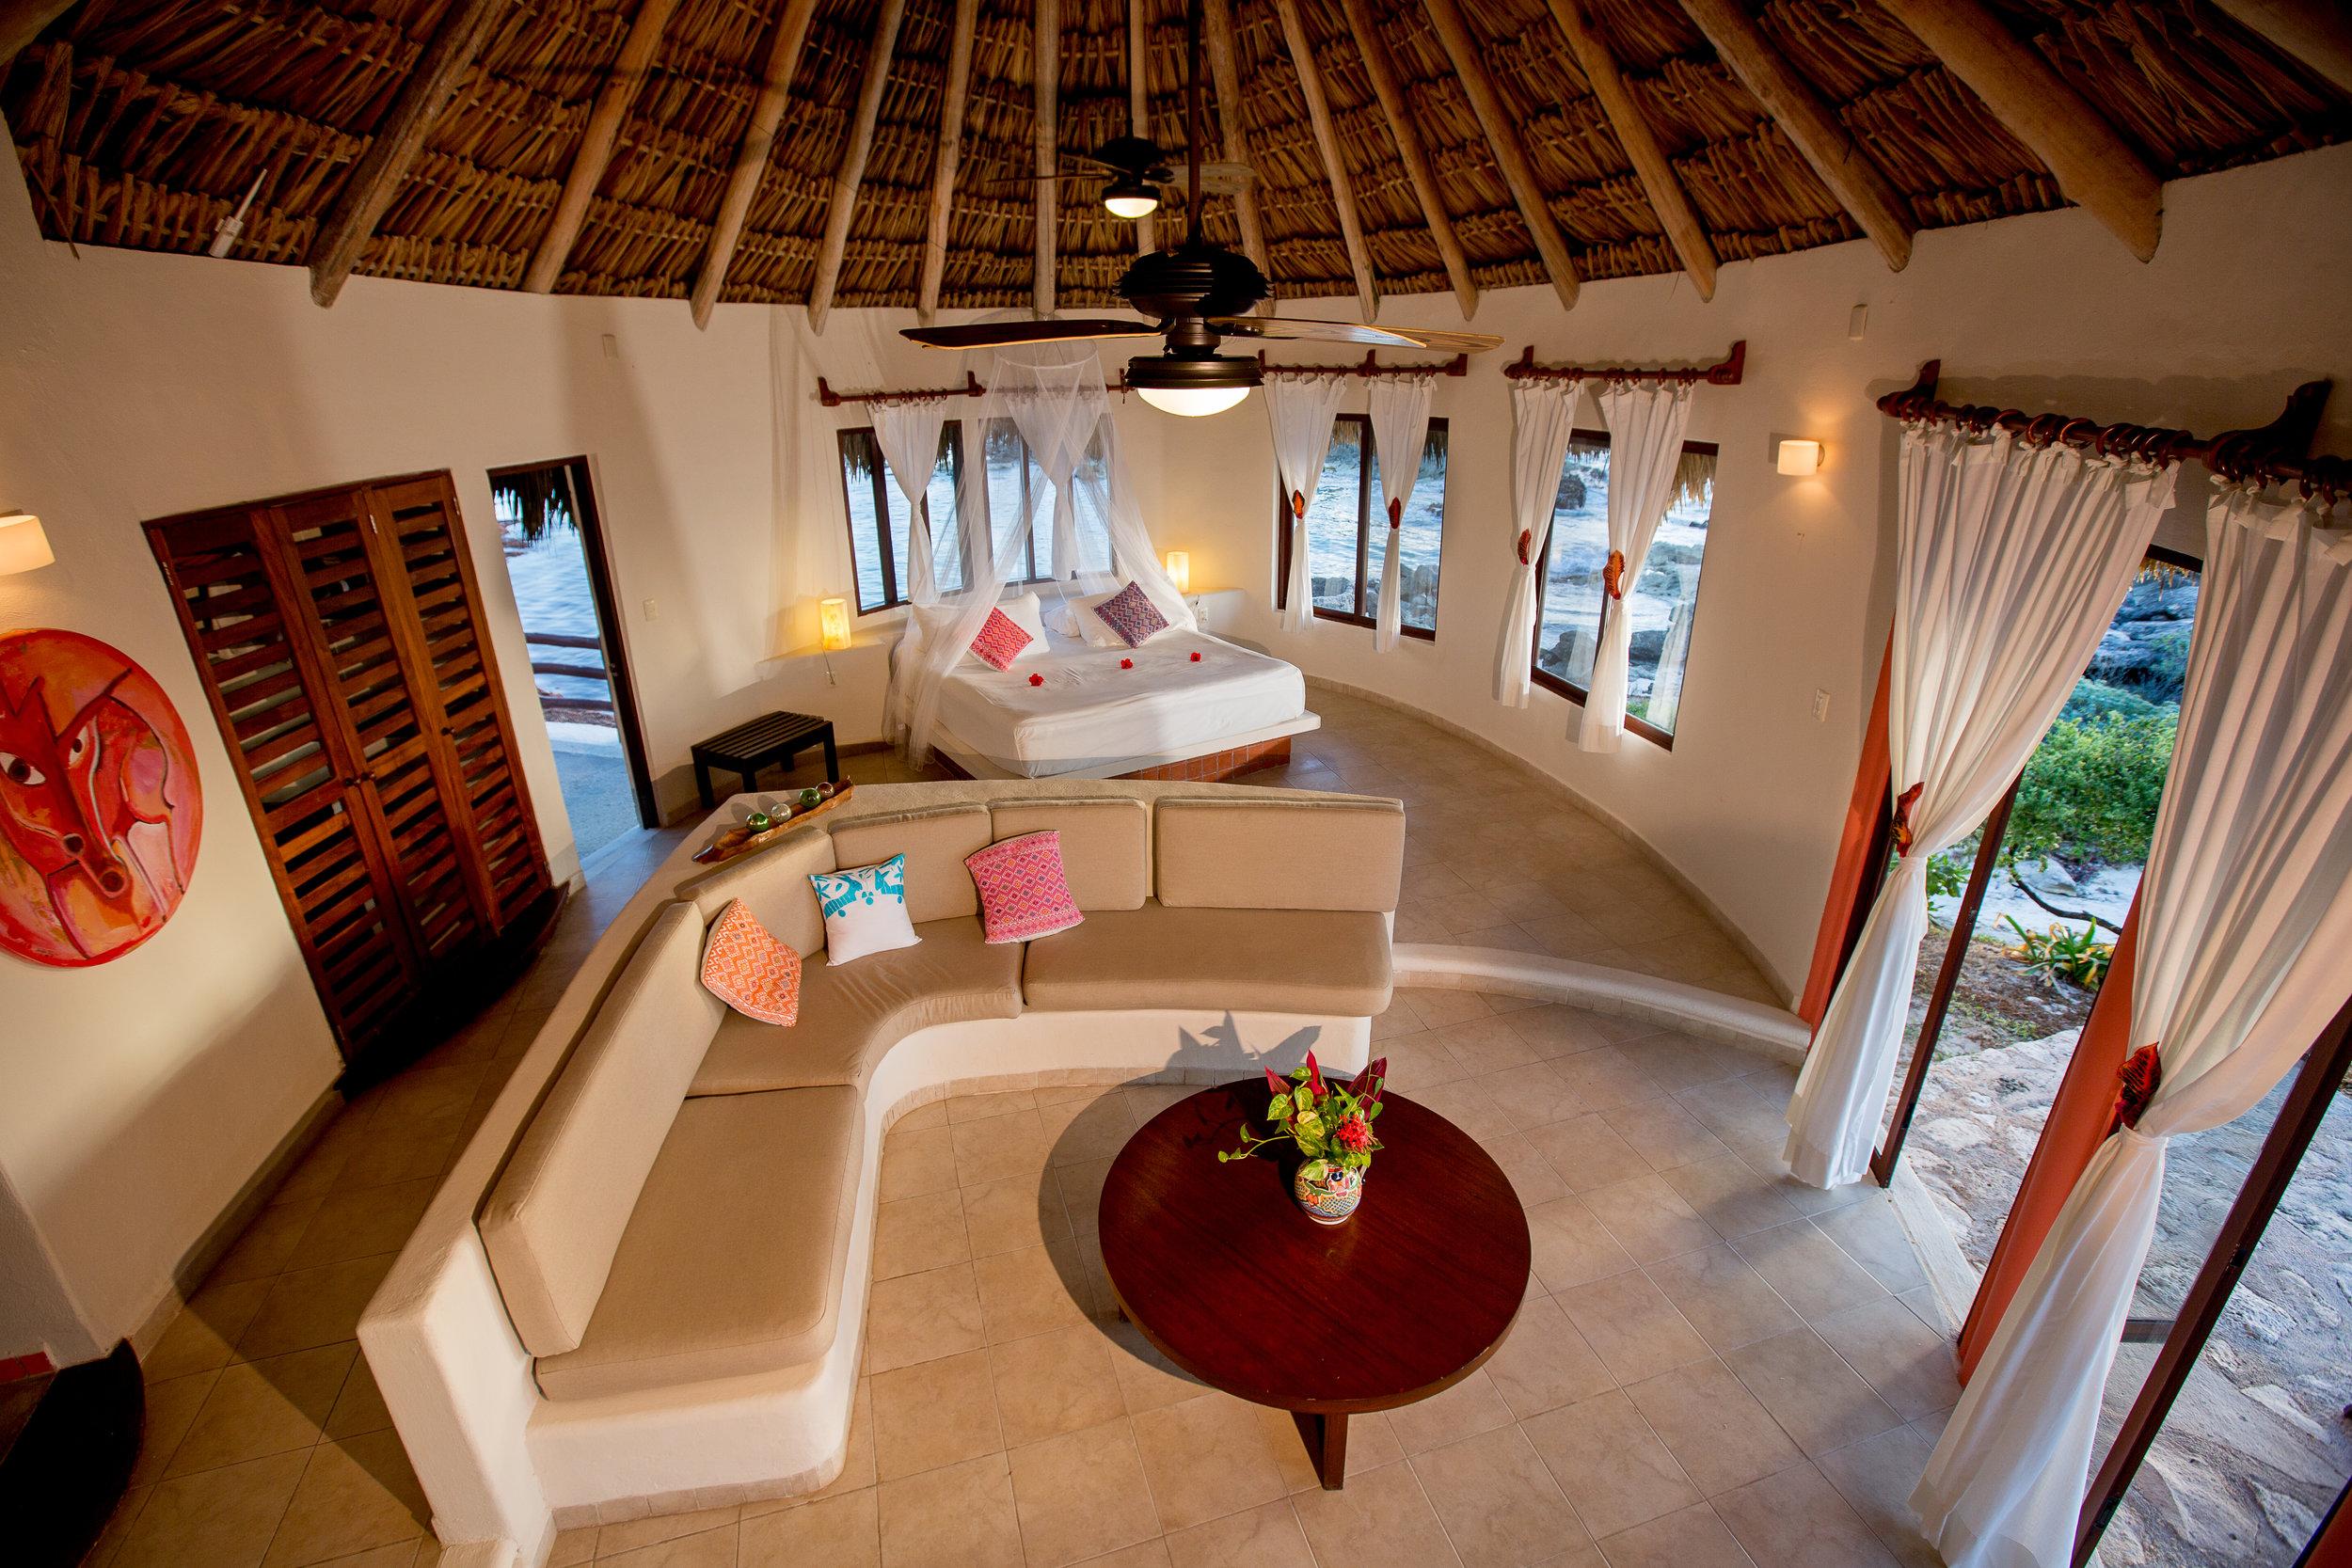 Maya_Tulum_Spa_Resort_woodandsmith.com-7.jpg